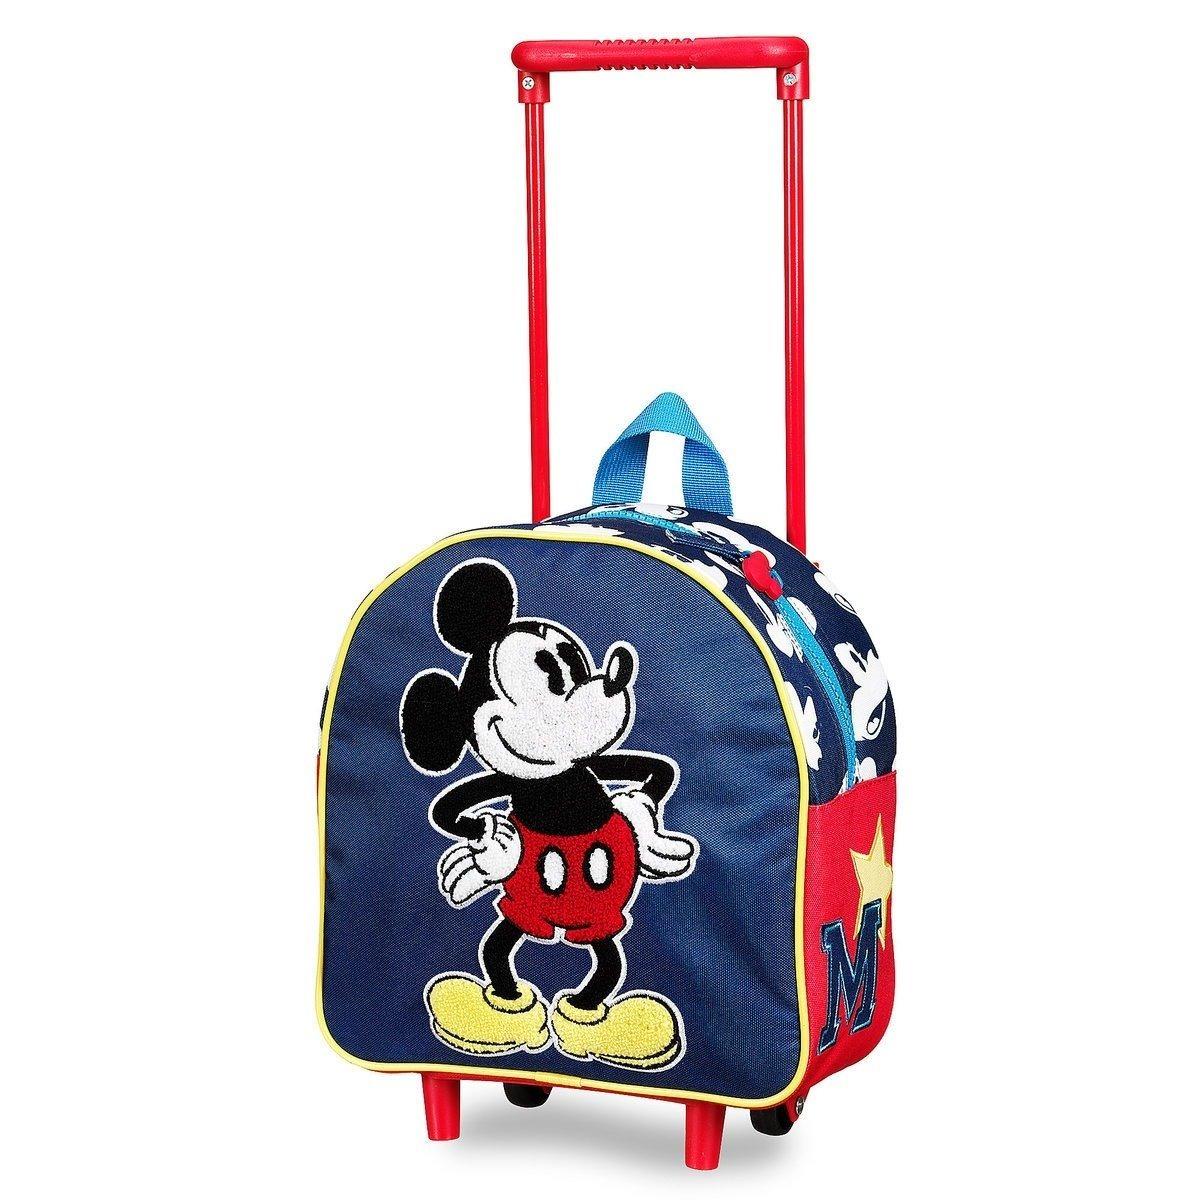 6ad6d2d00 mickey mouse mini maleta 33x25cm con ruedas disney store. Cargando zoom.